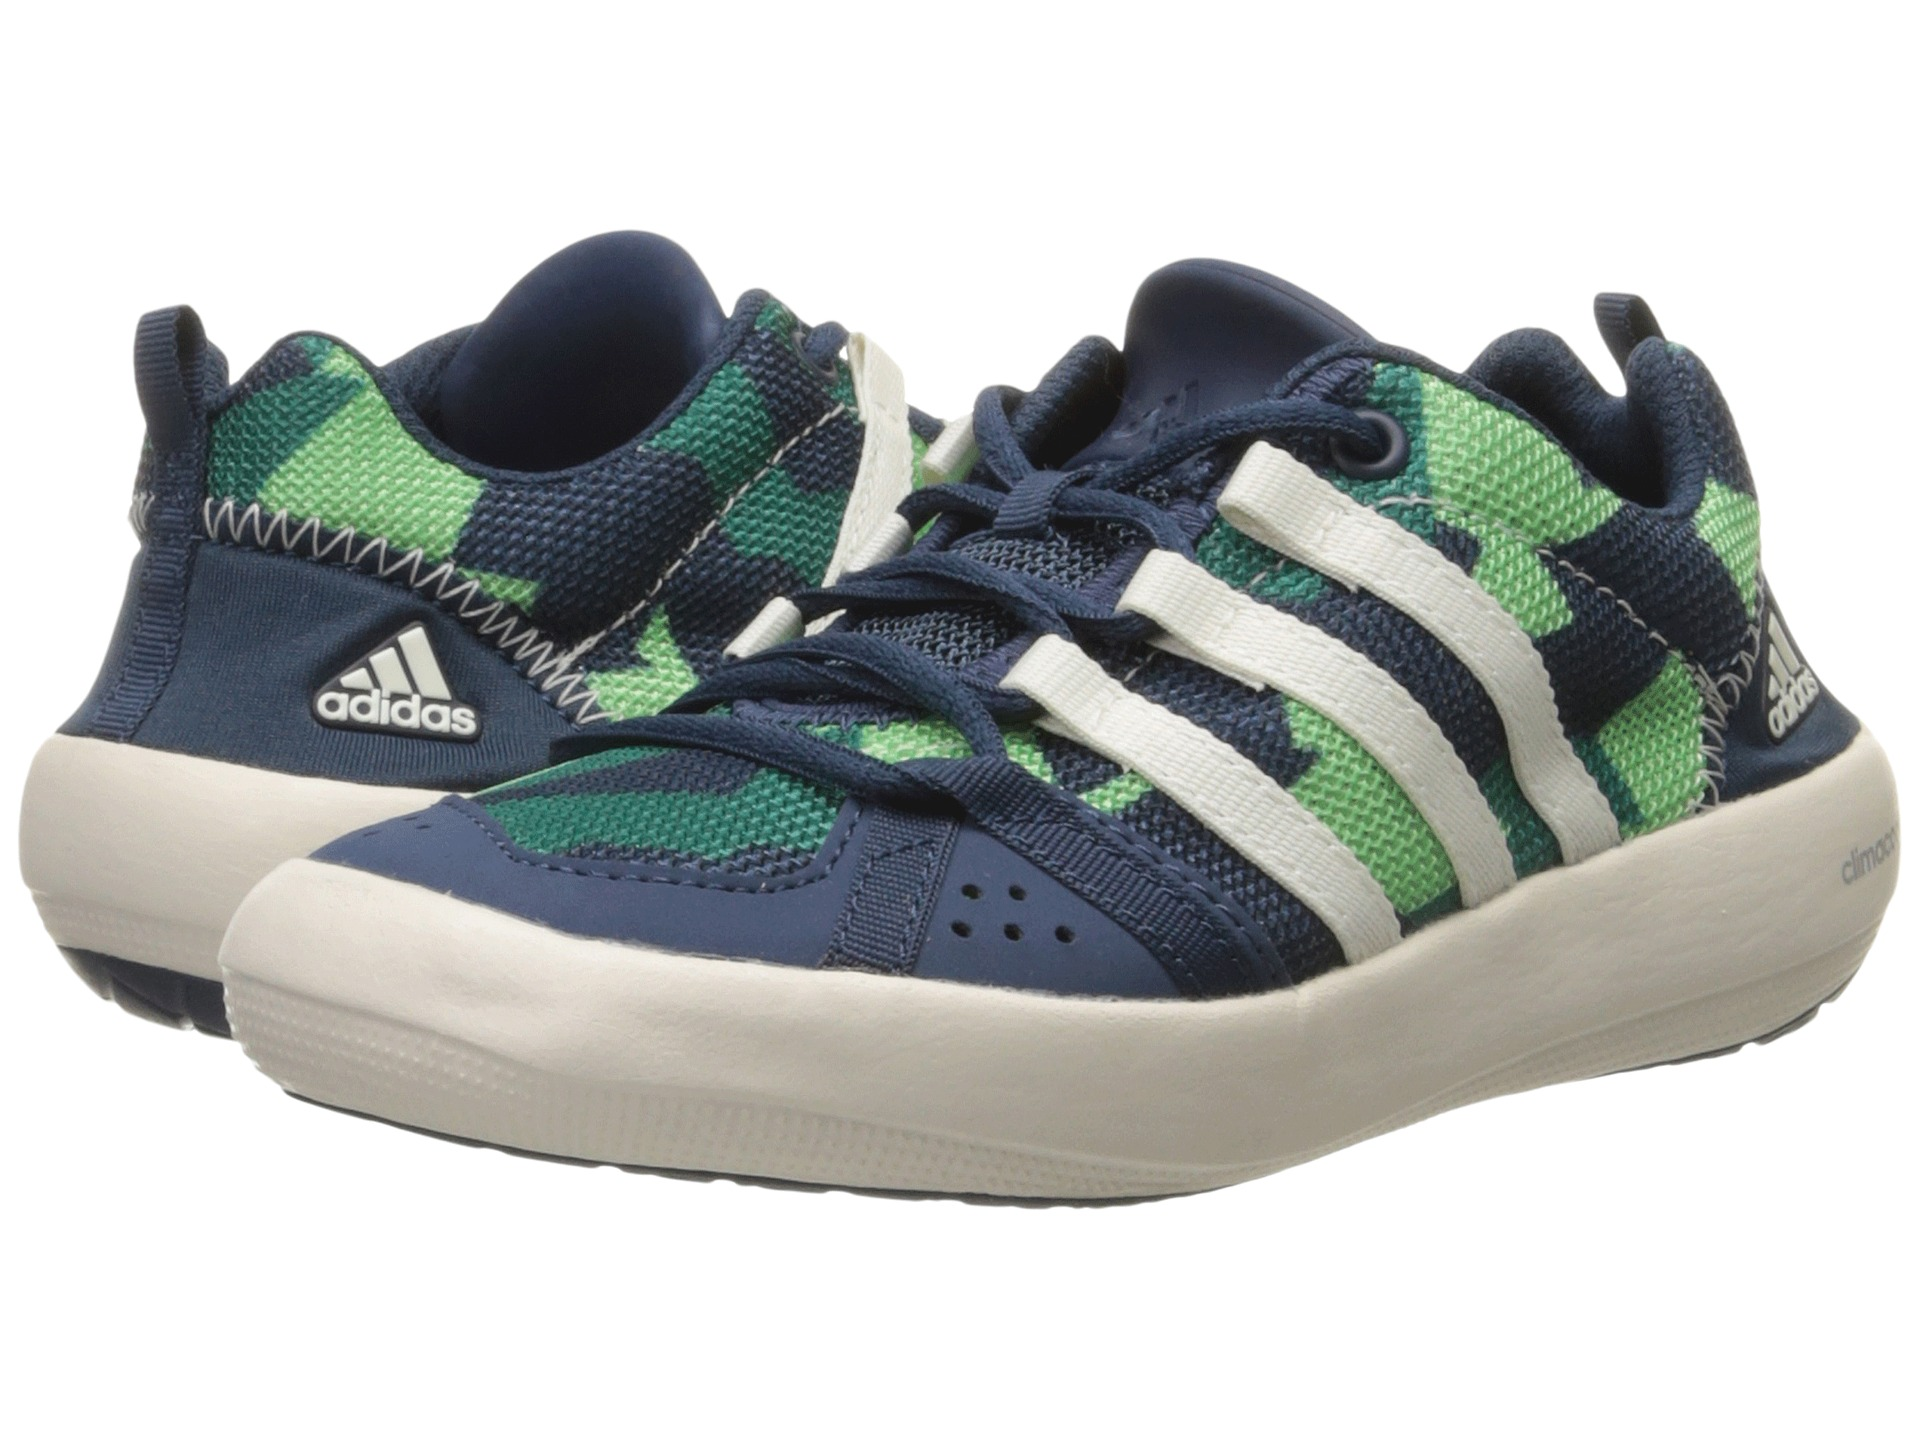 separation shoes d44a3 395bc ireland adidas climacool boys 0cad1 e07cb